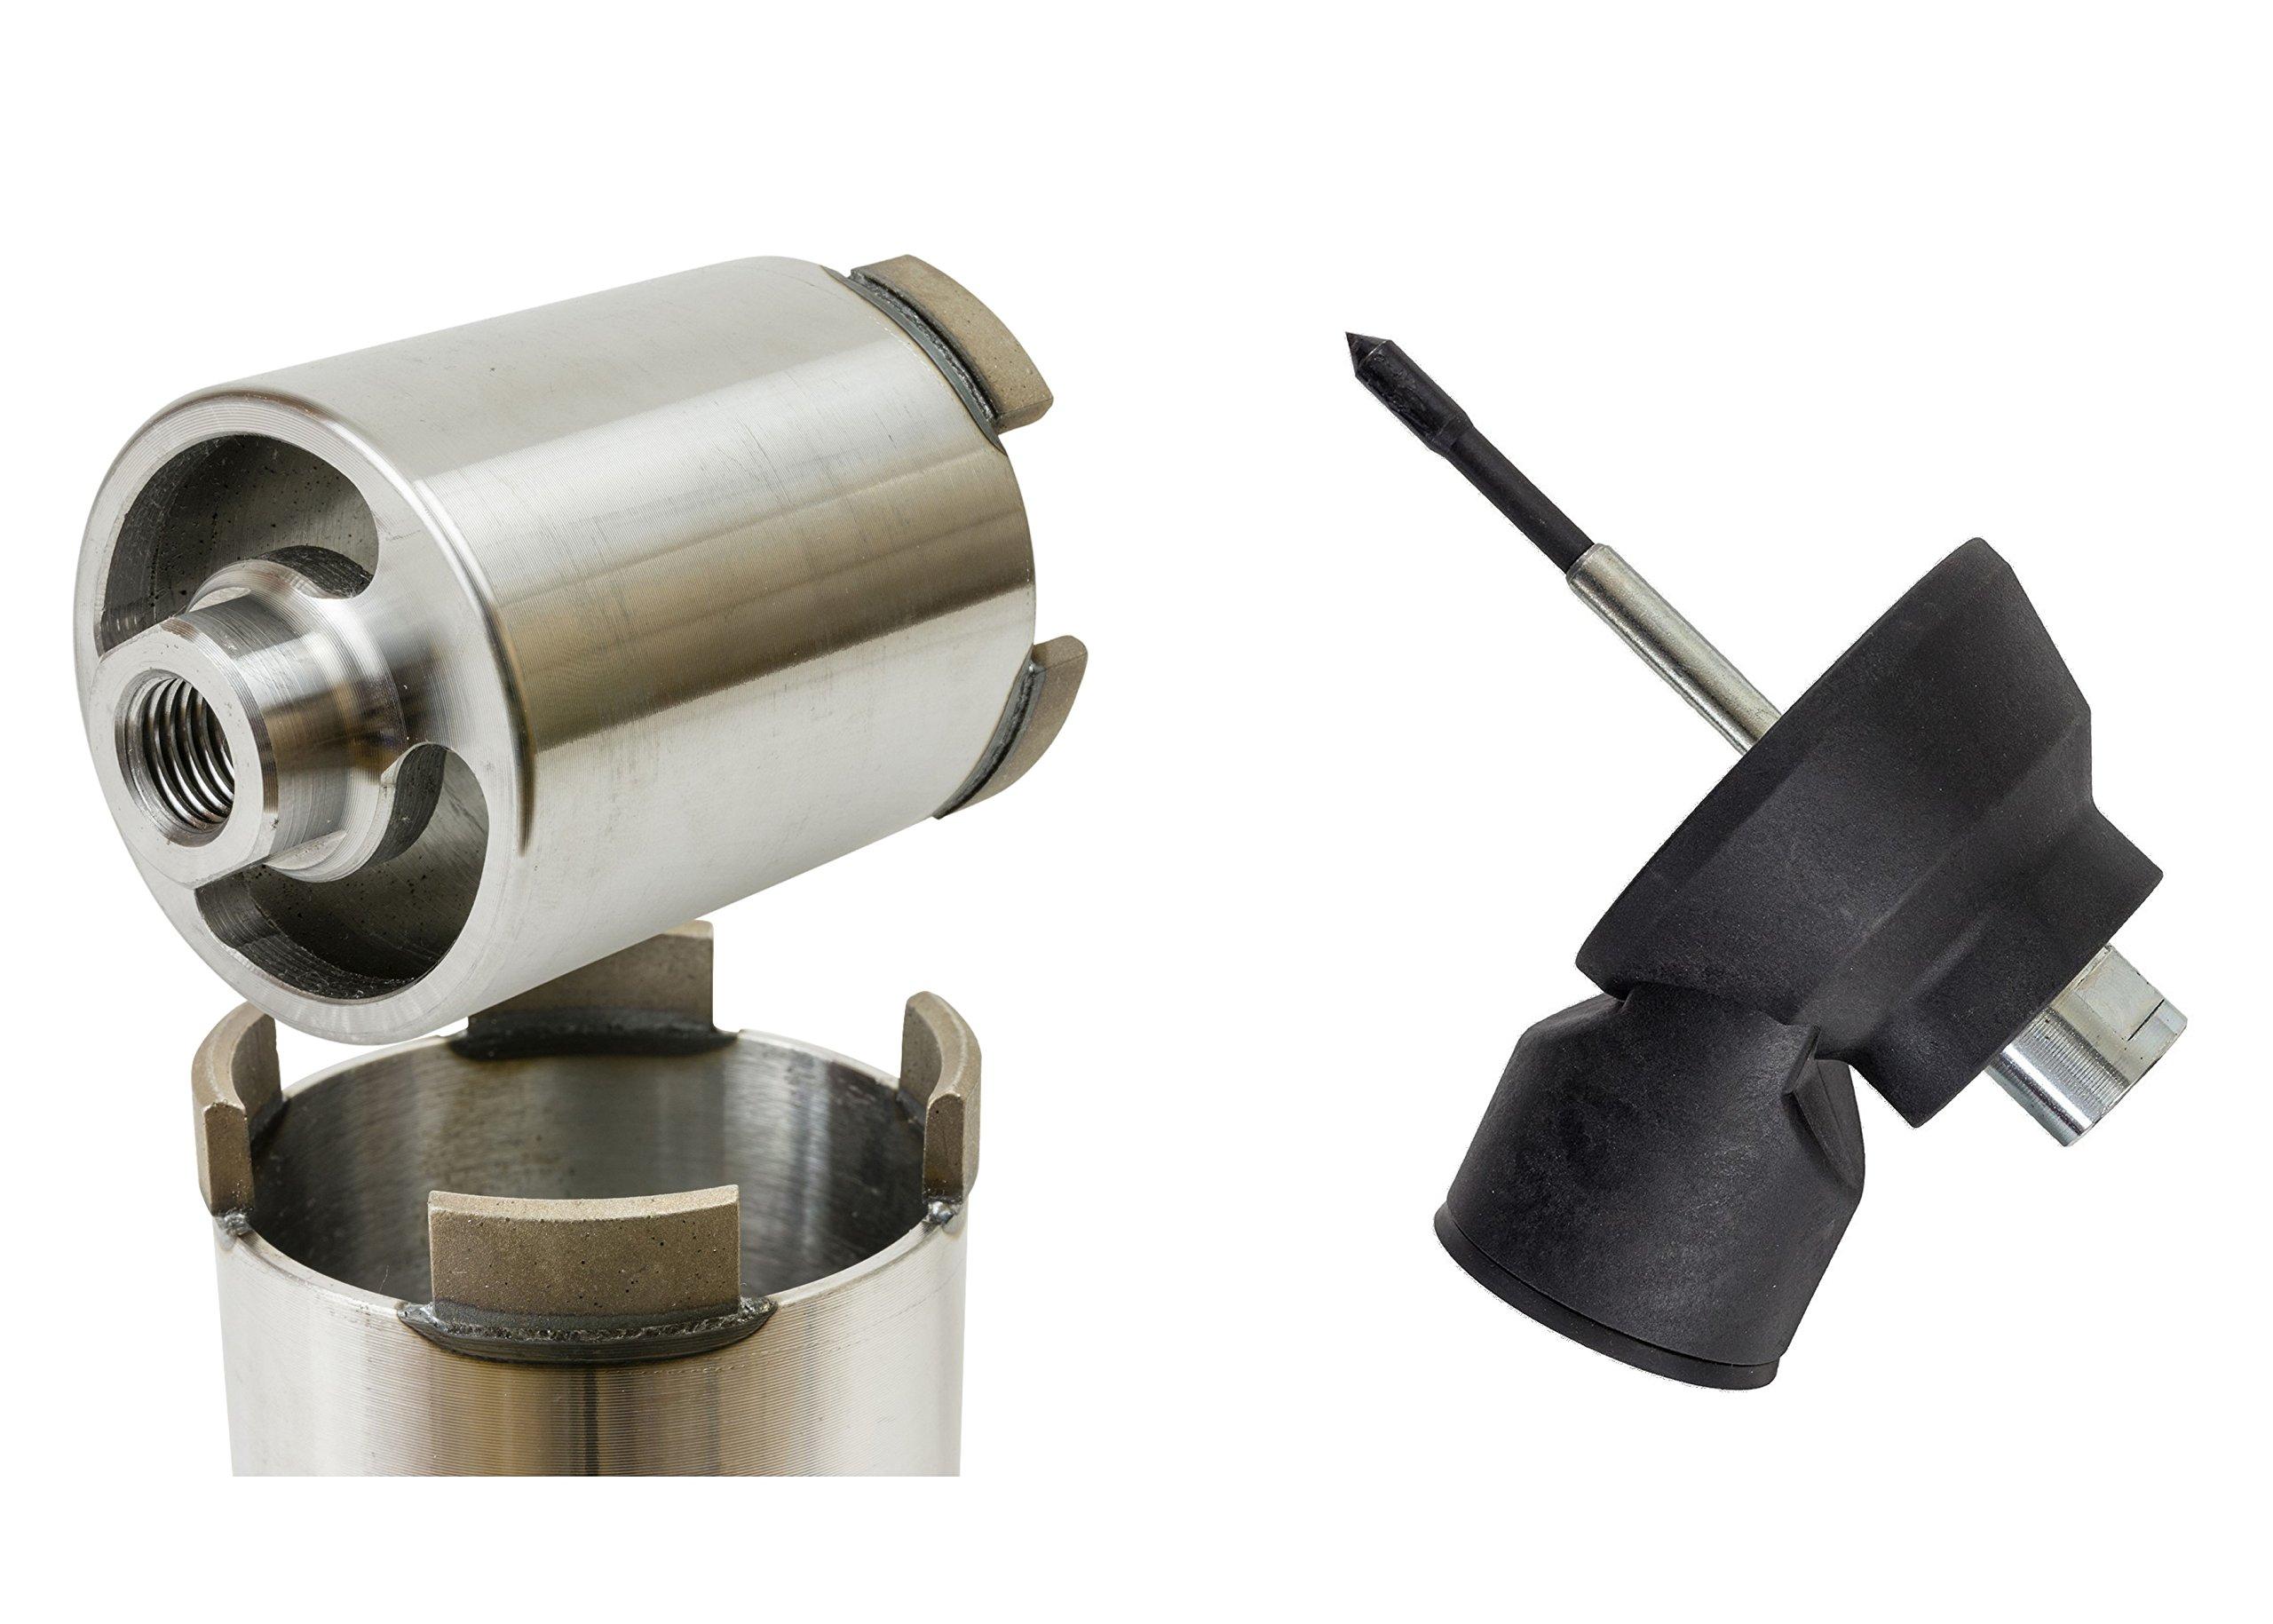 Eibenstock-Trocken-Kernbohrmaschine-EHD-2000-S-inklusive-Staubabsaugung-Diamant-Dosensenker